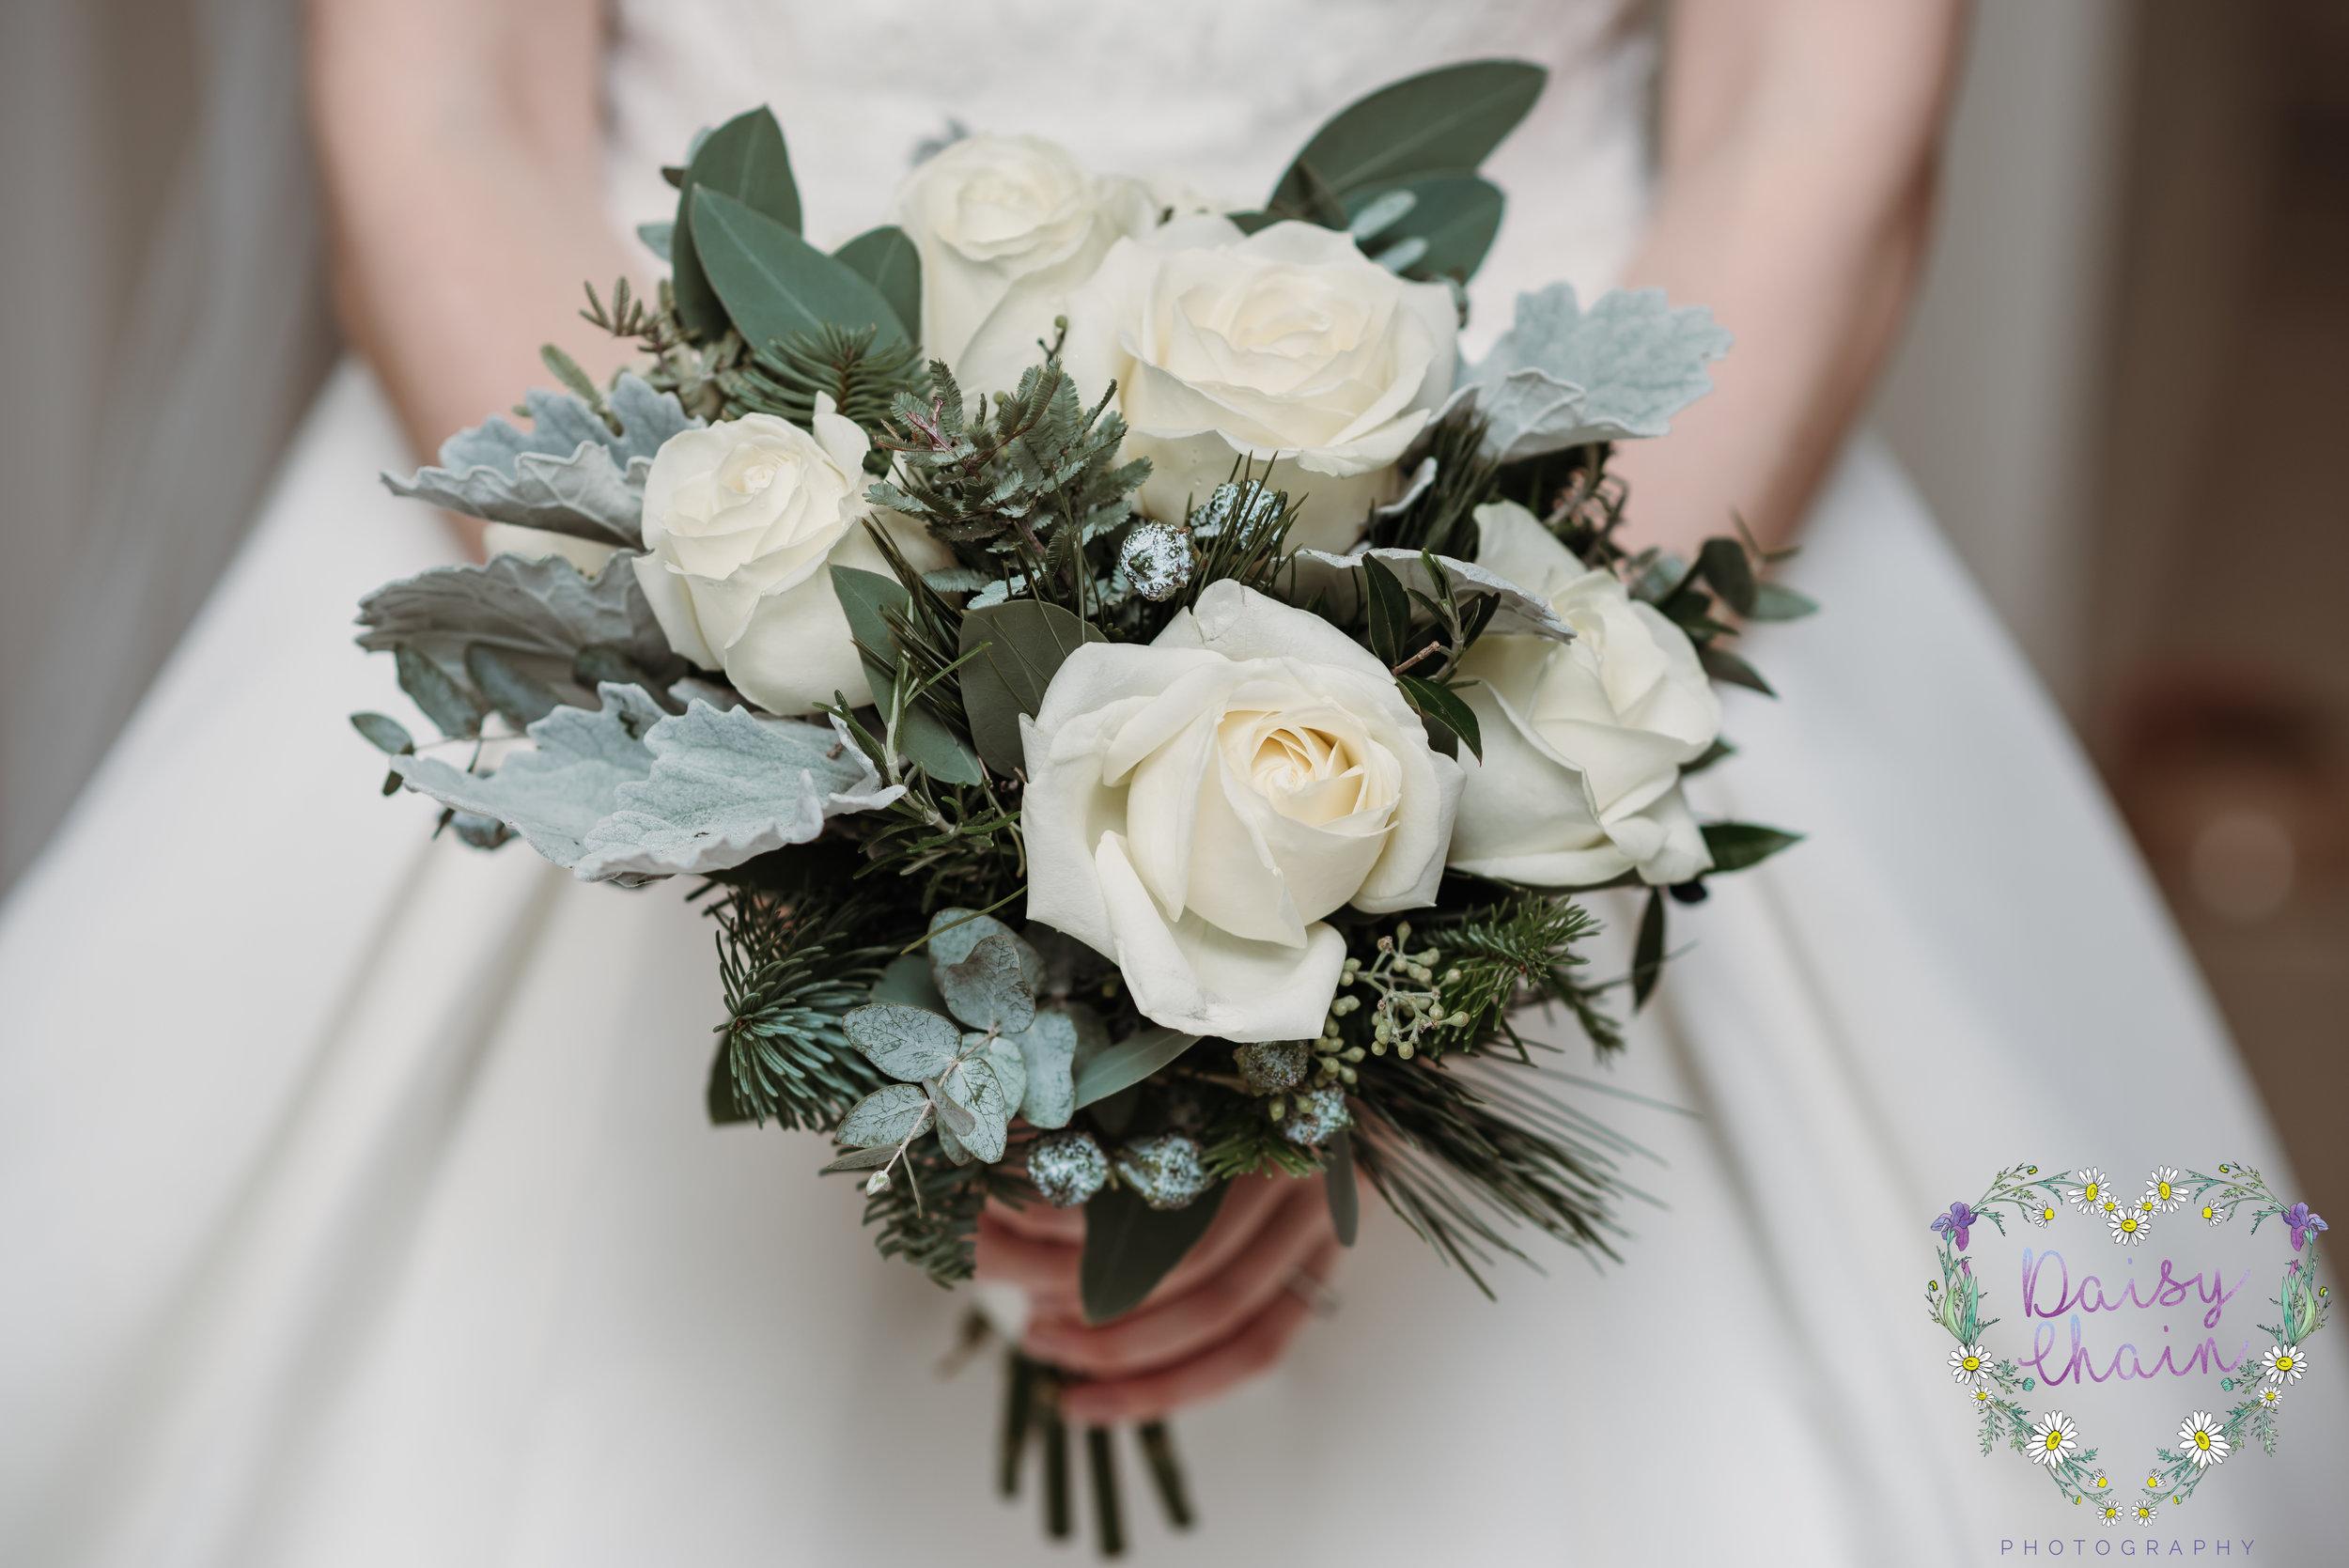 Stunning bridal bouquet - lancashire